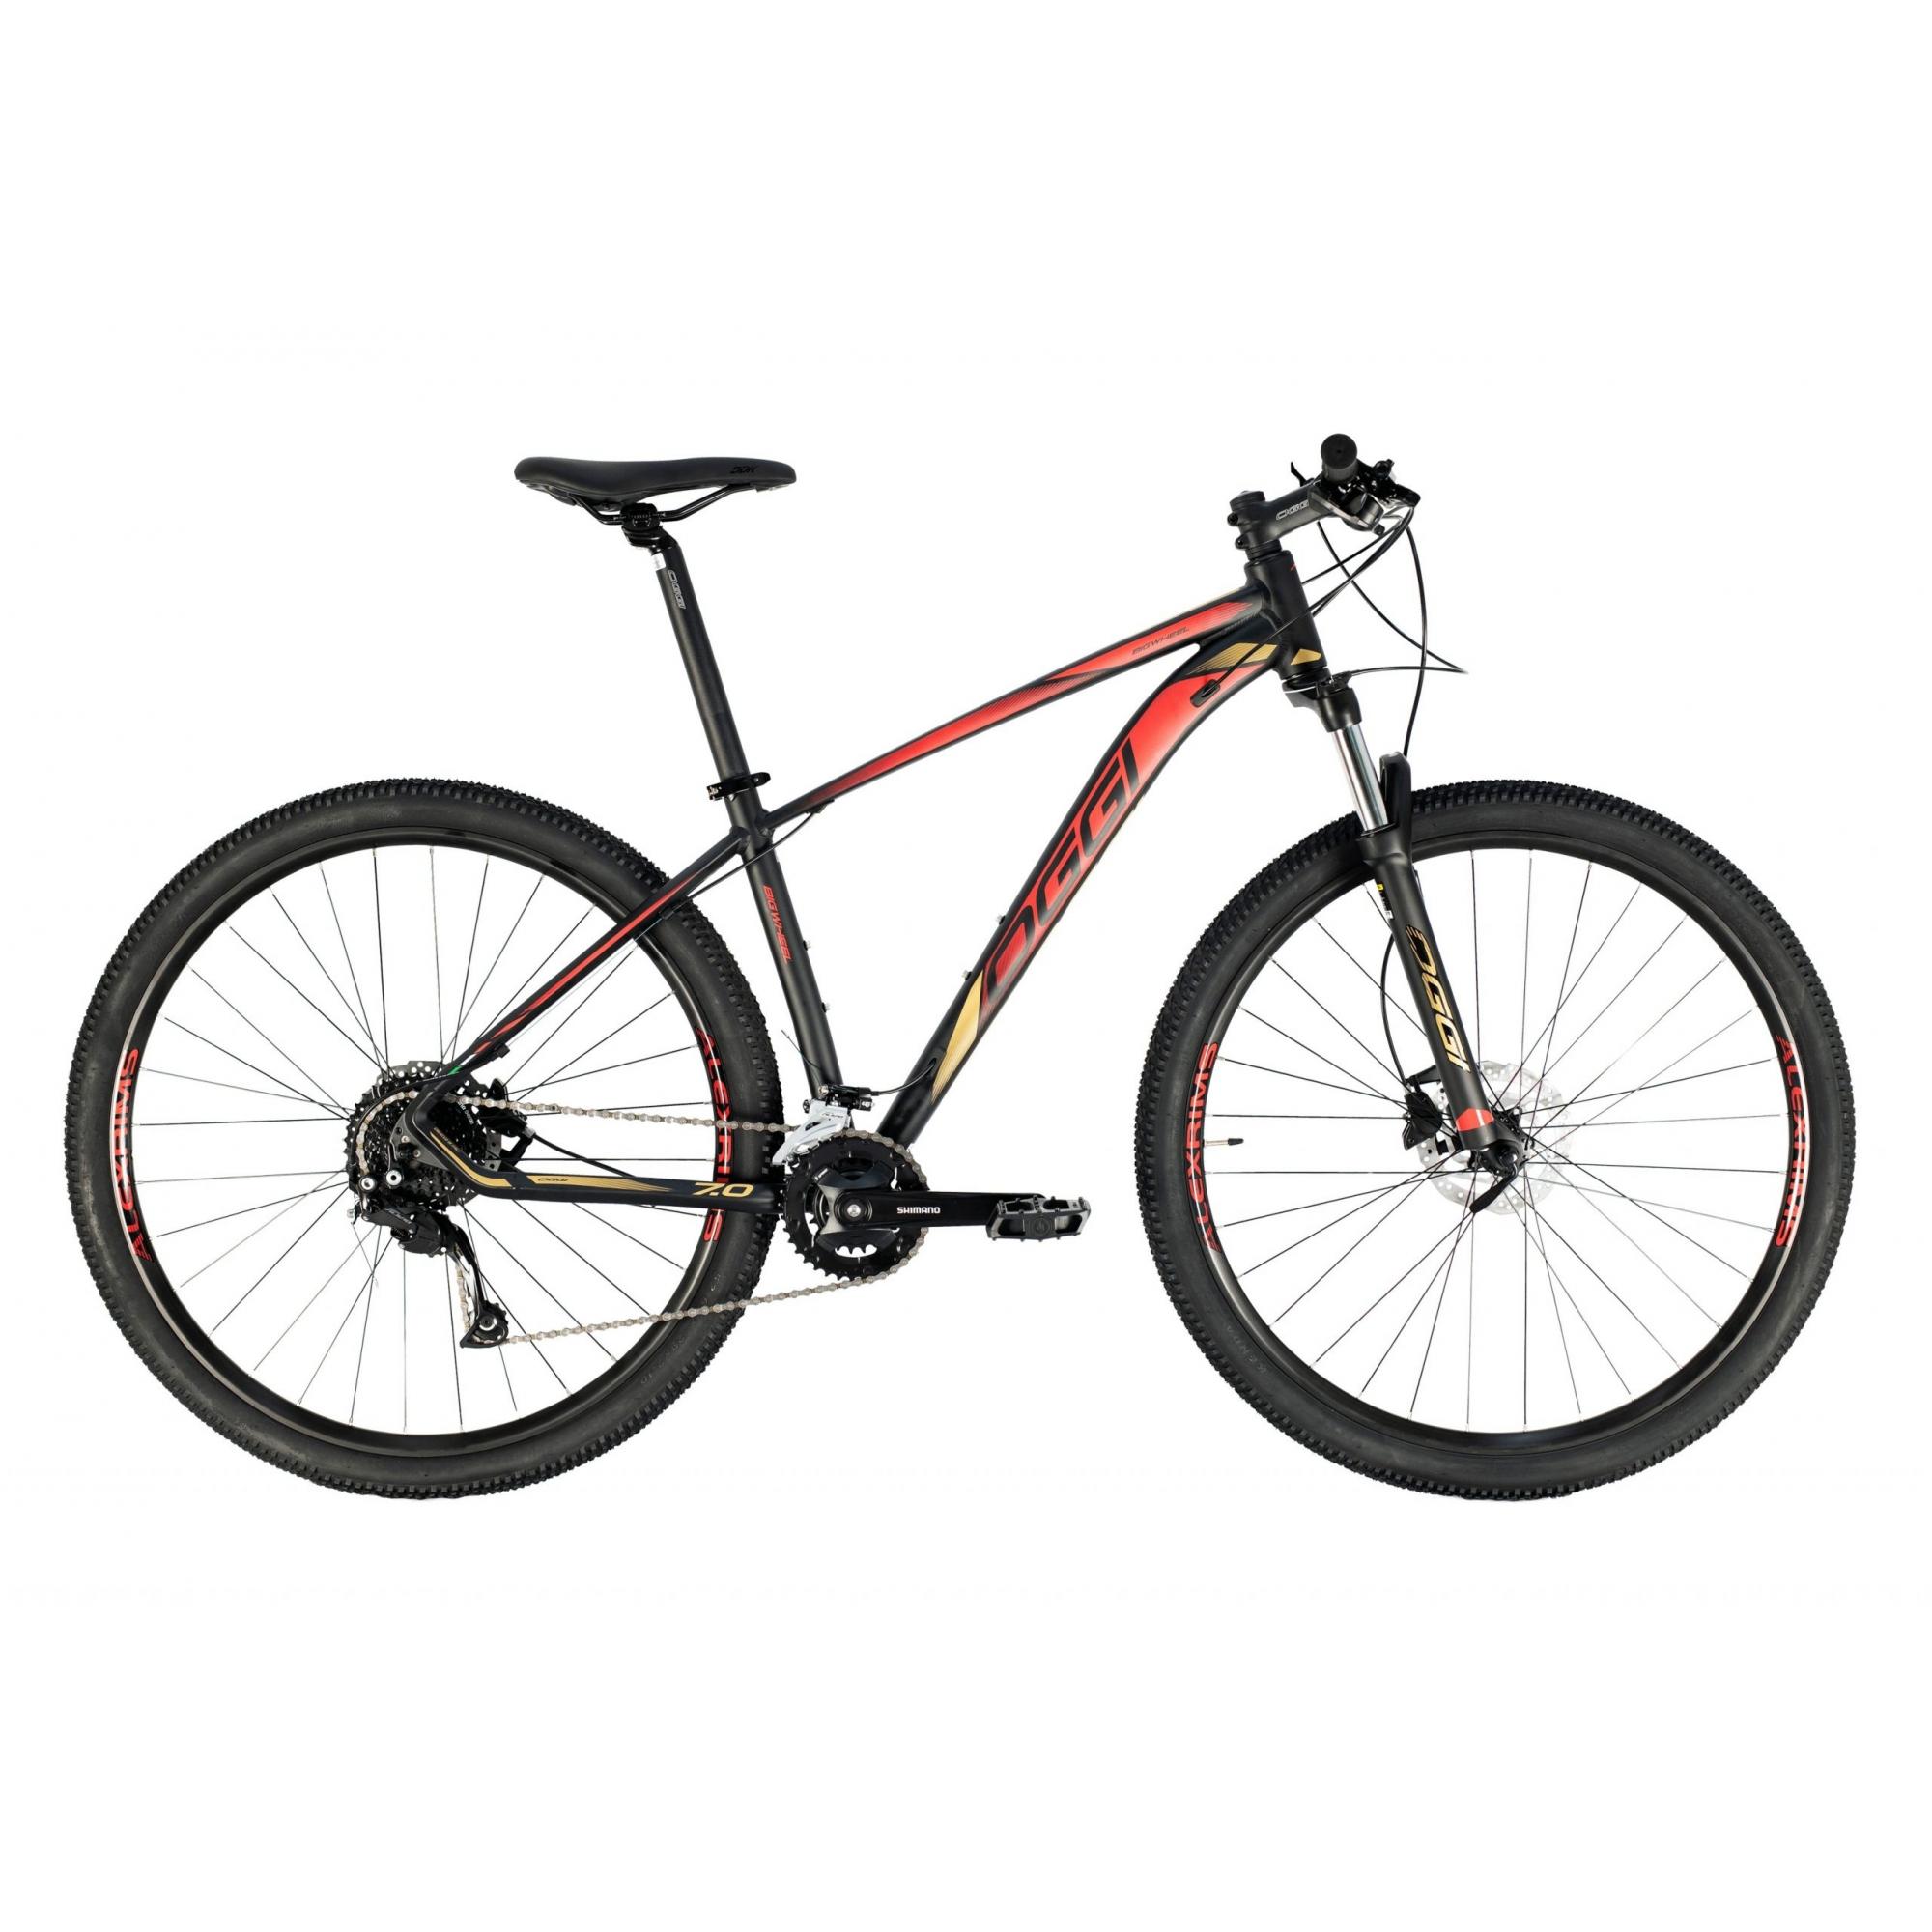 Bicicleta aro 29 Oggi Big Wheel 7.0 Alivio 18 Velocidades